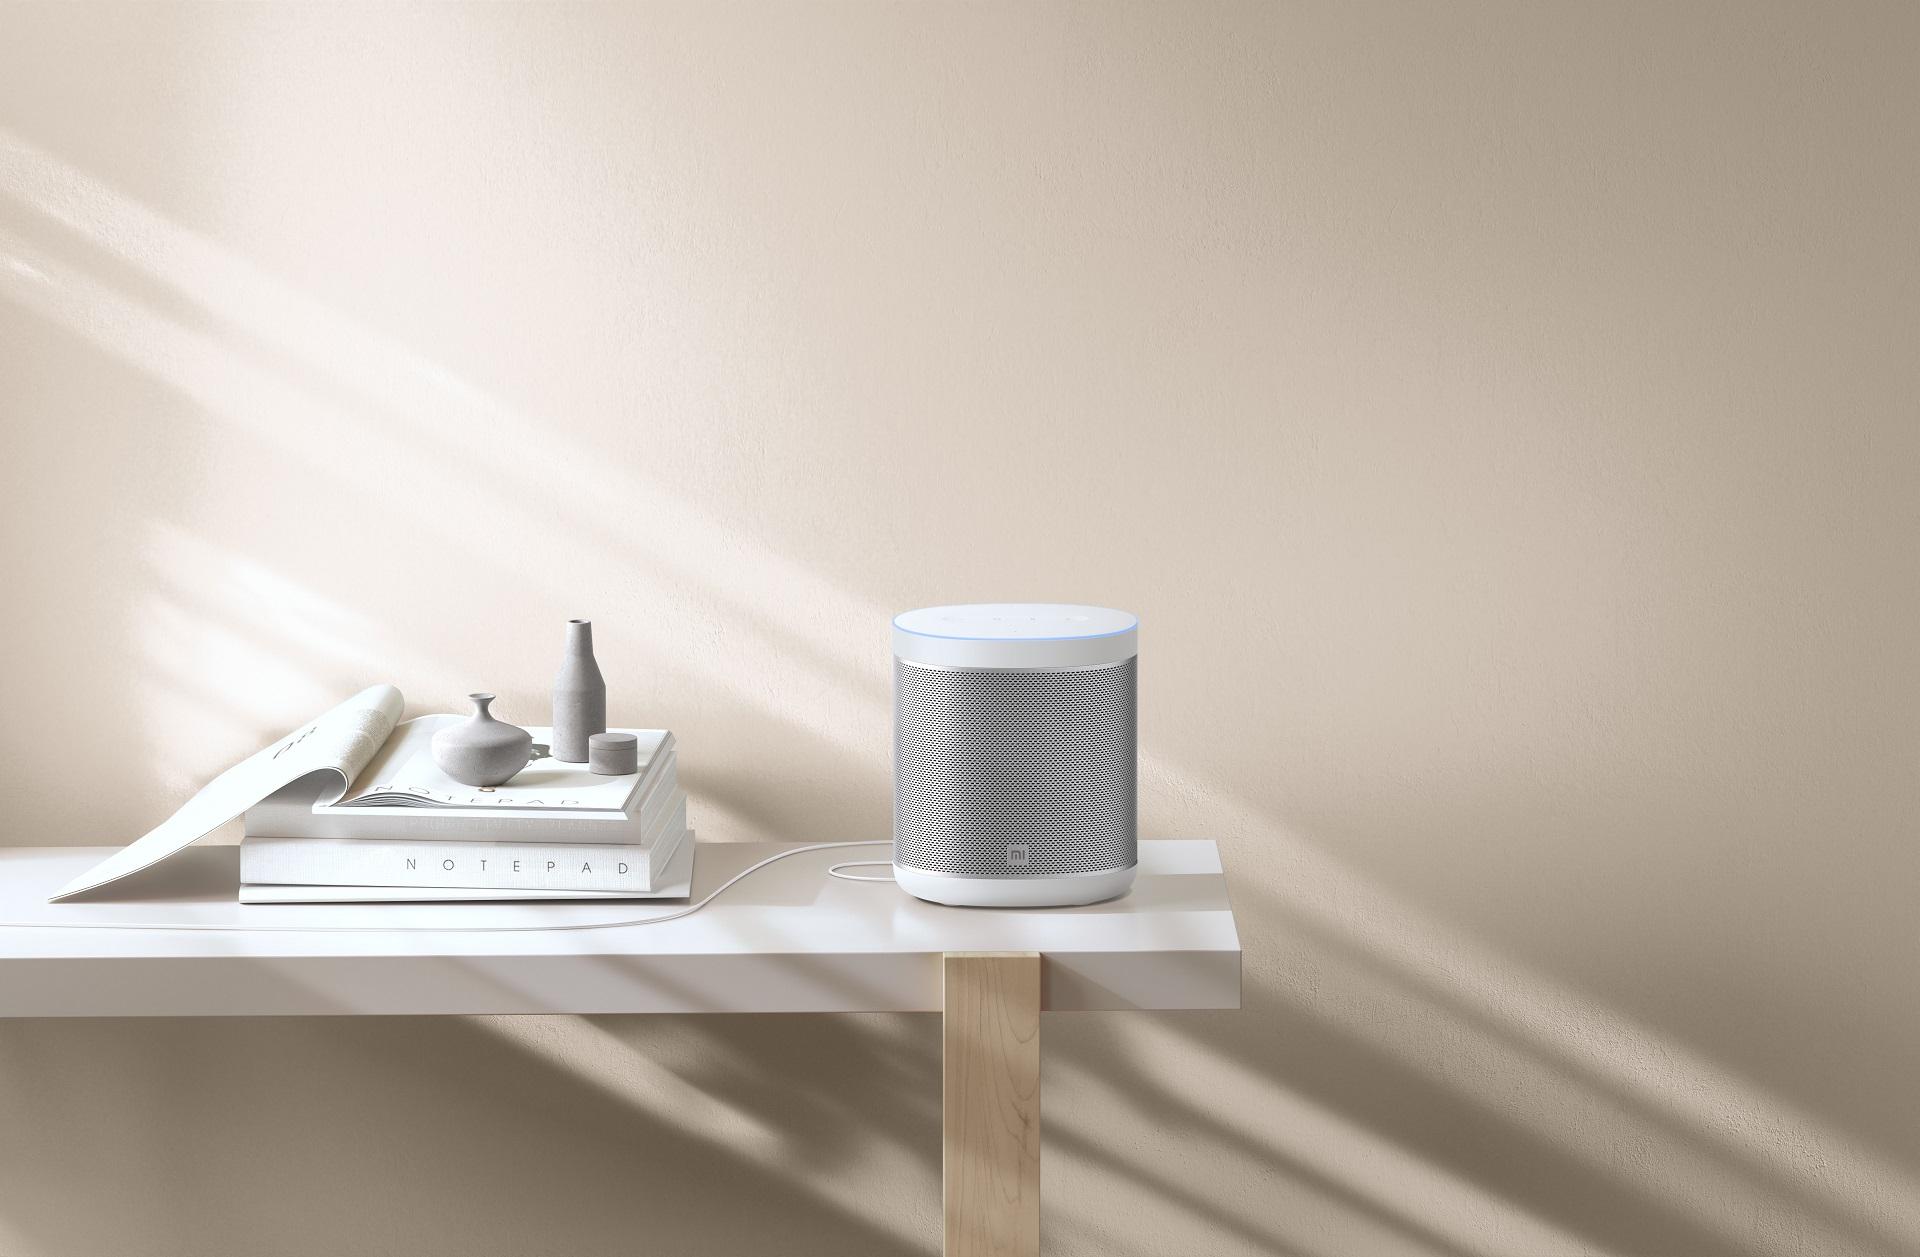 Xiaomi lance son Mi Smart Speaker — Enceinte connectée